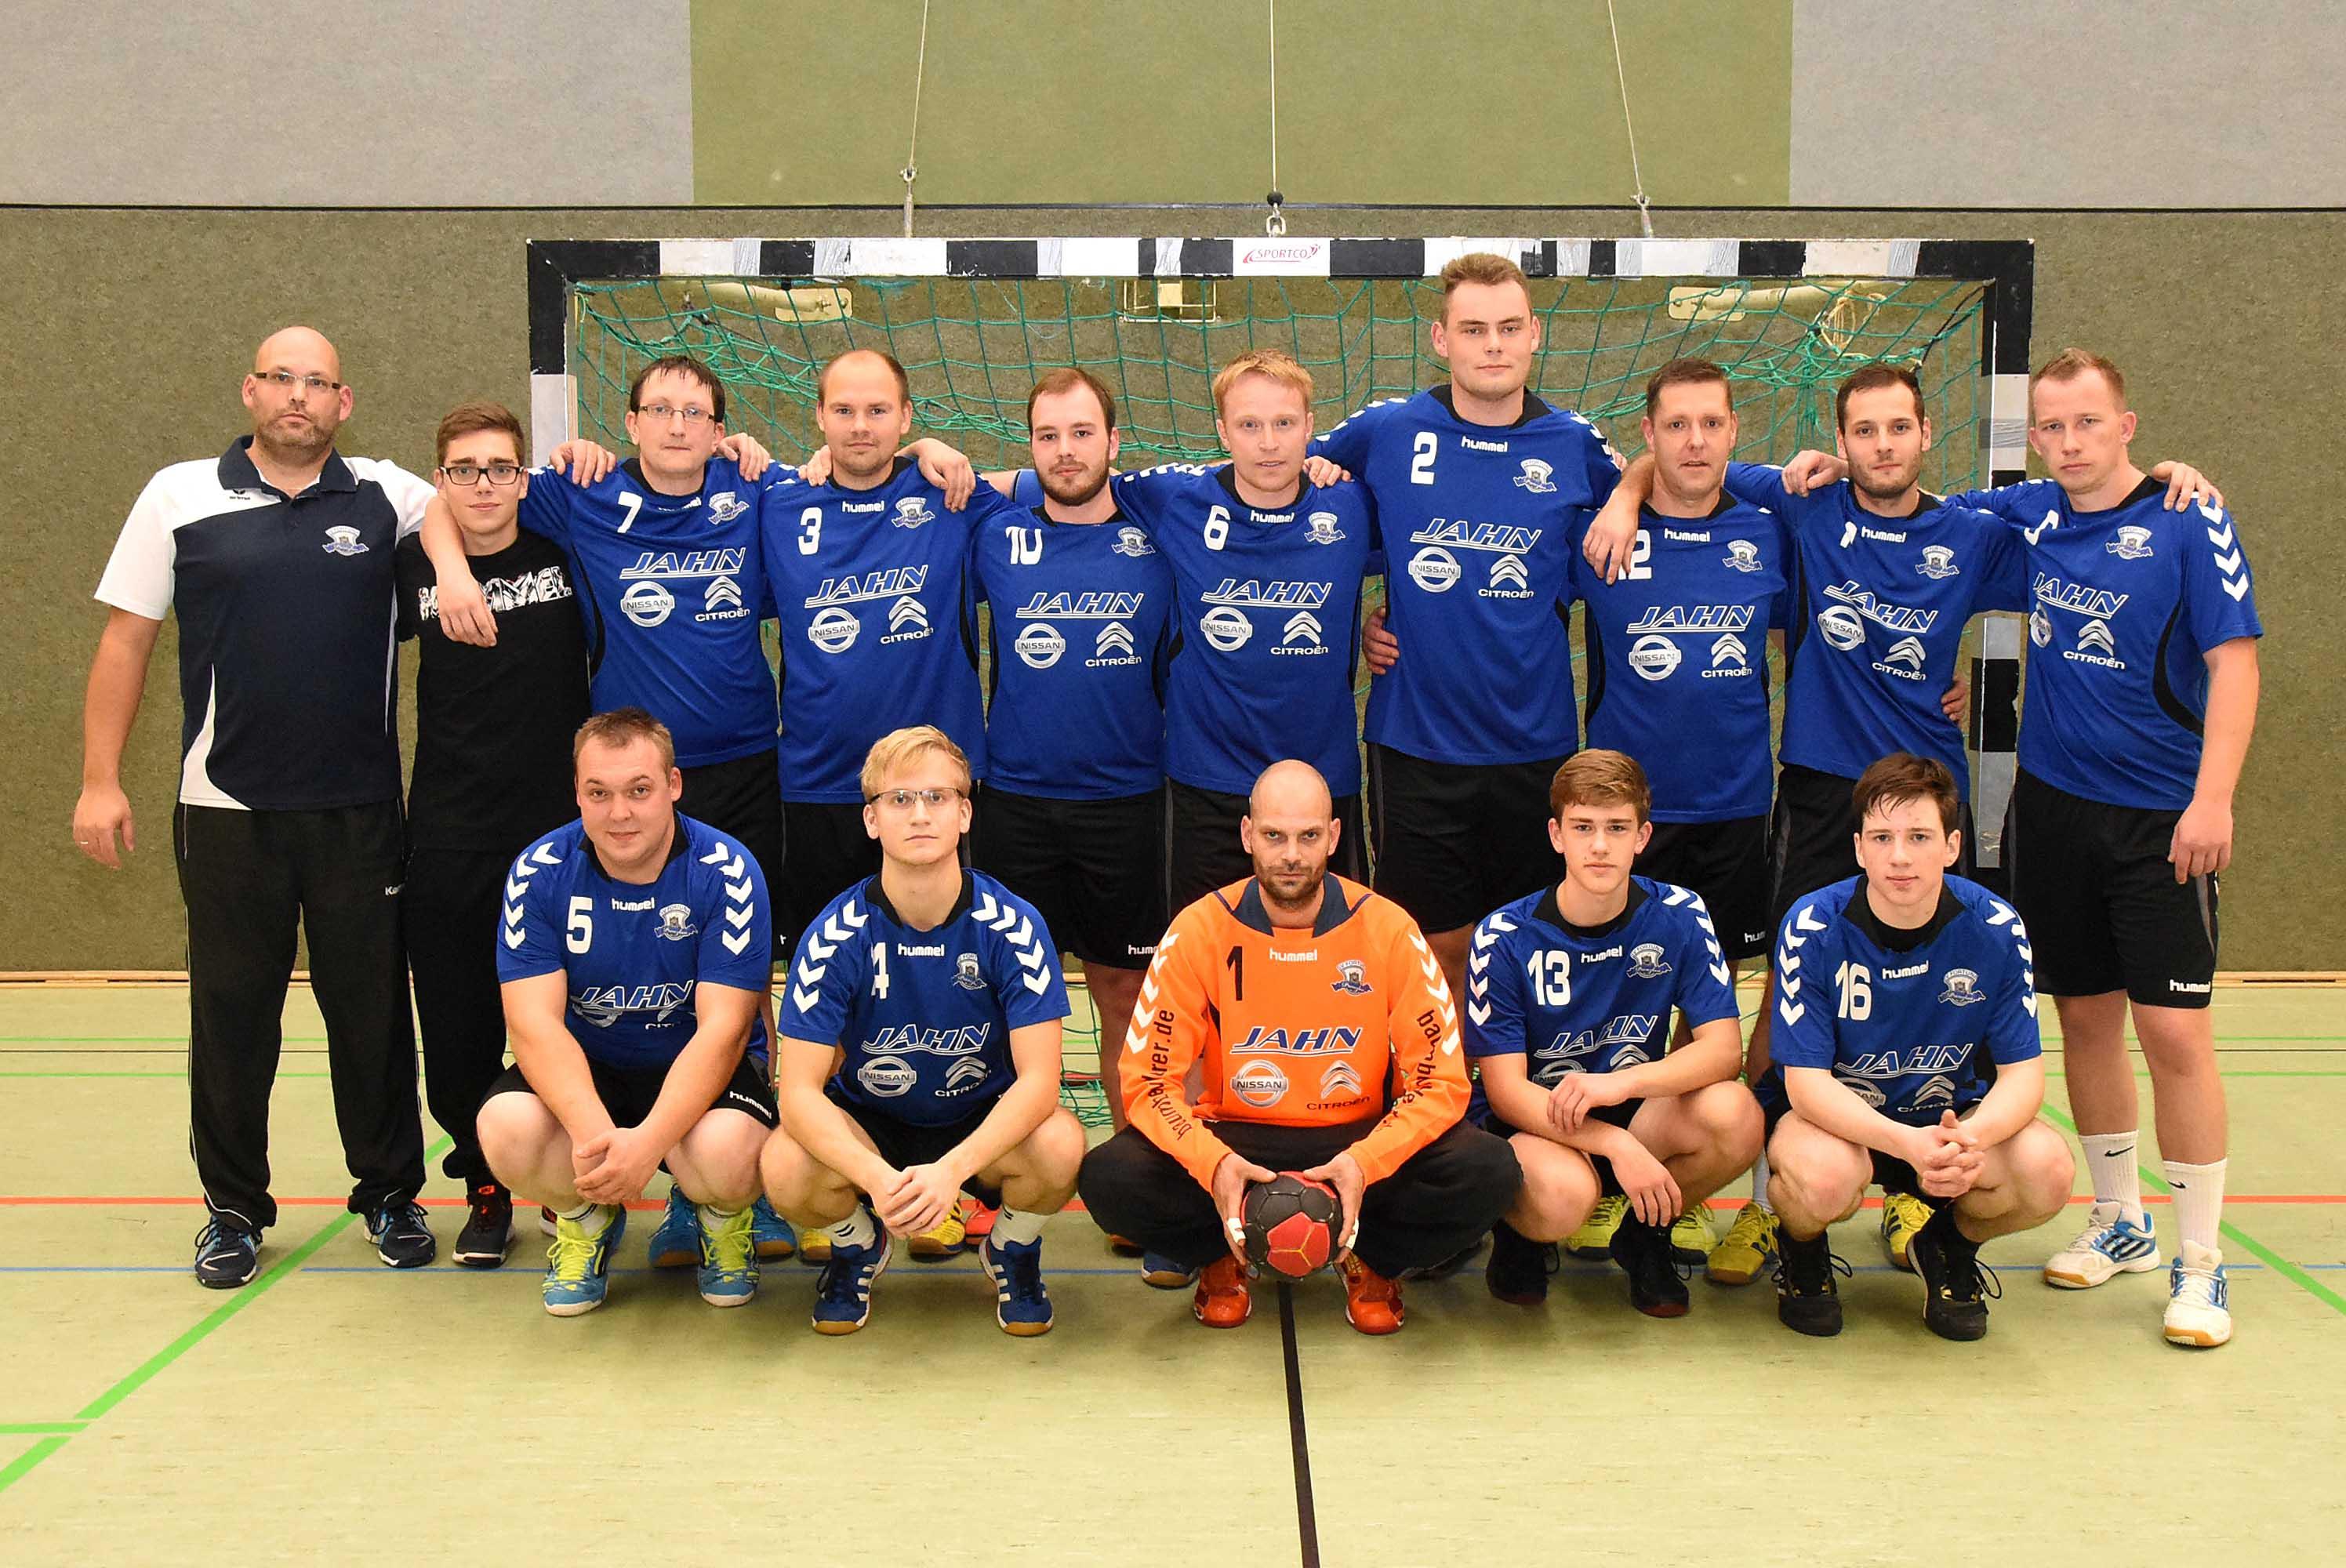 maenner-saison-2016_17